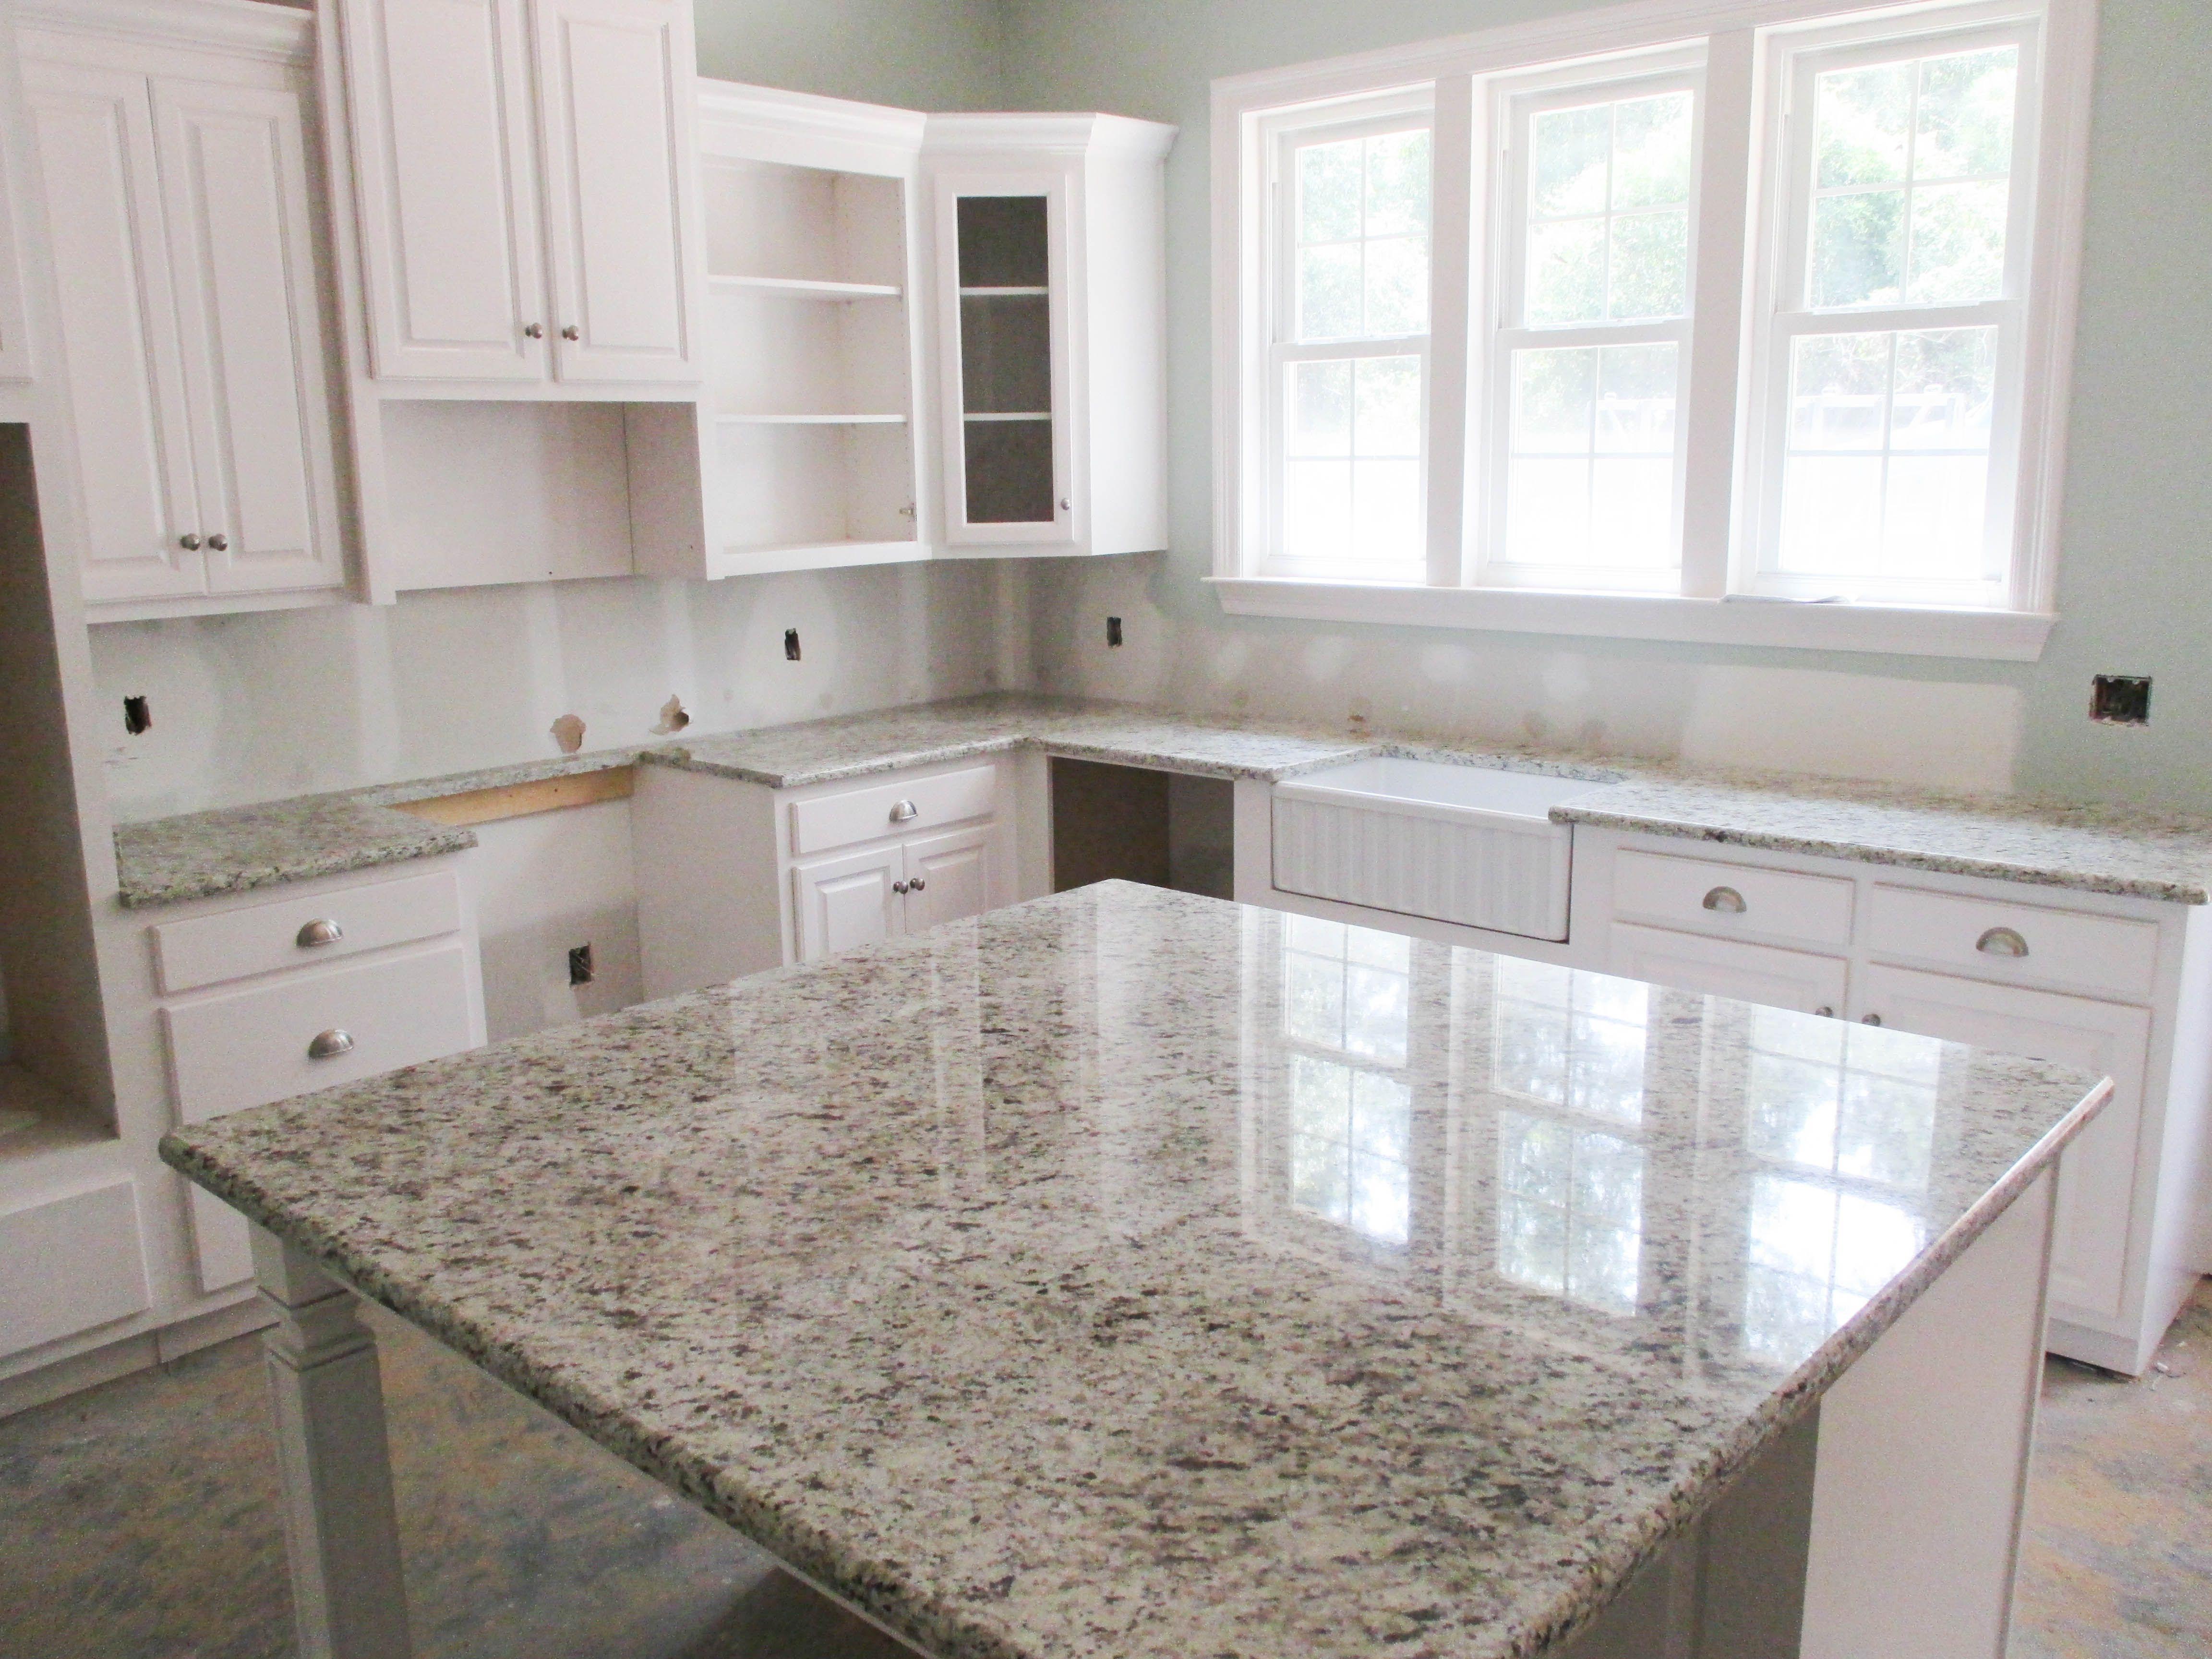 American Flooring Cabinets And Granite Giallo Verona